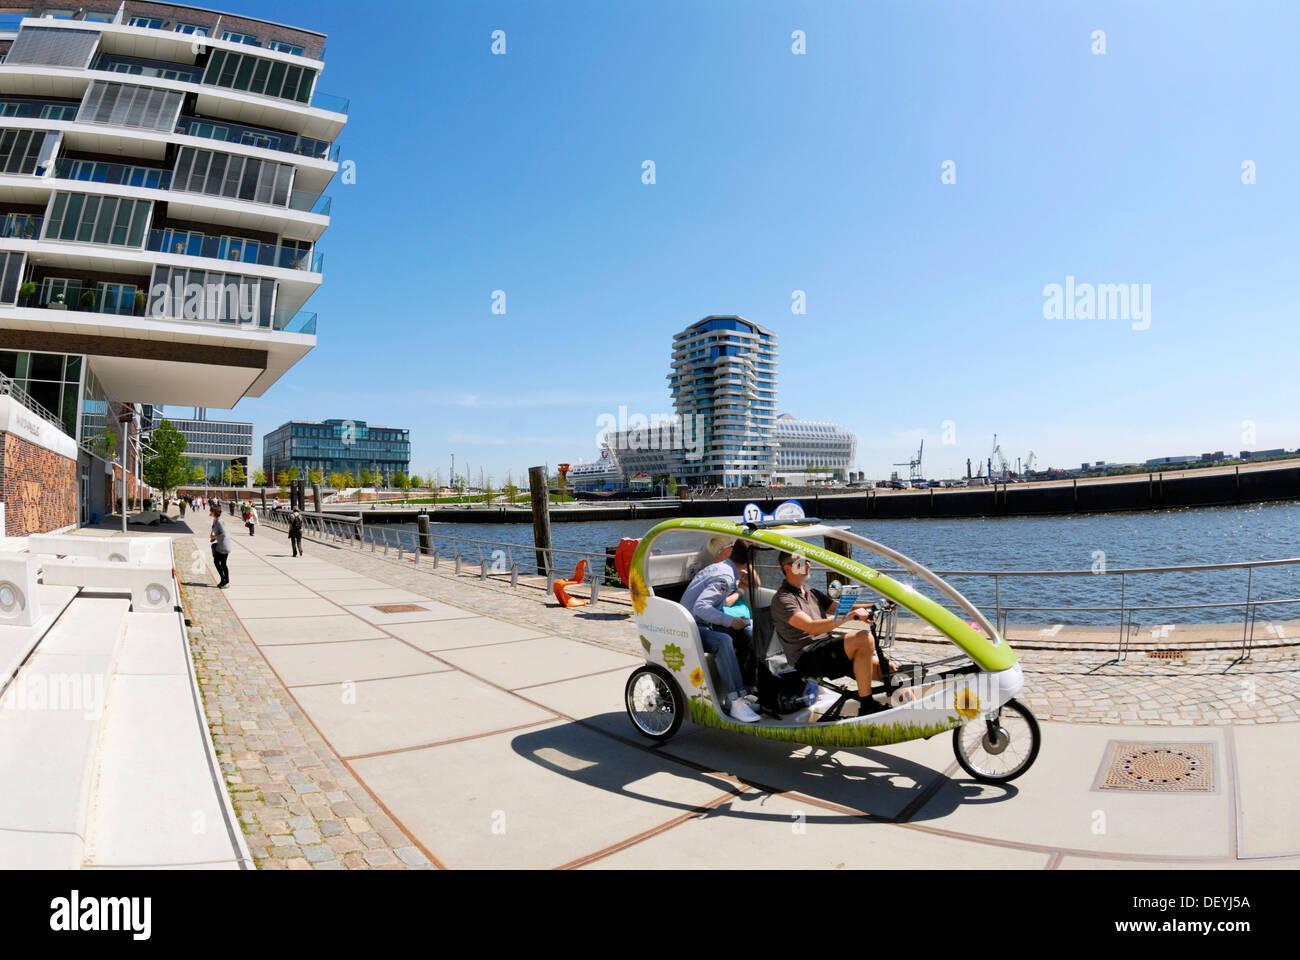 Bicycle taxi on the Dalmannkai Promenade, Hafencity, Hamburg - Stock Image